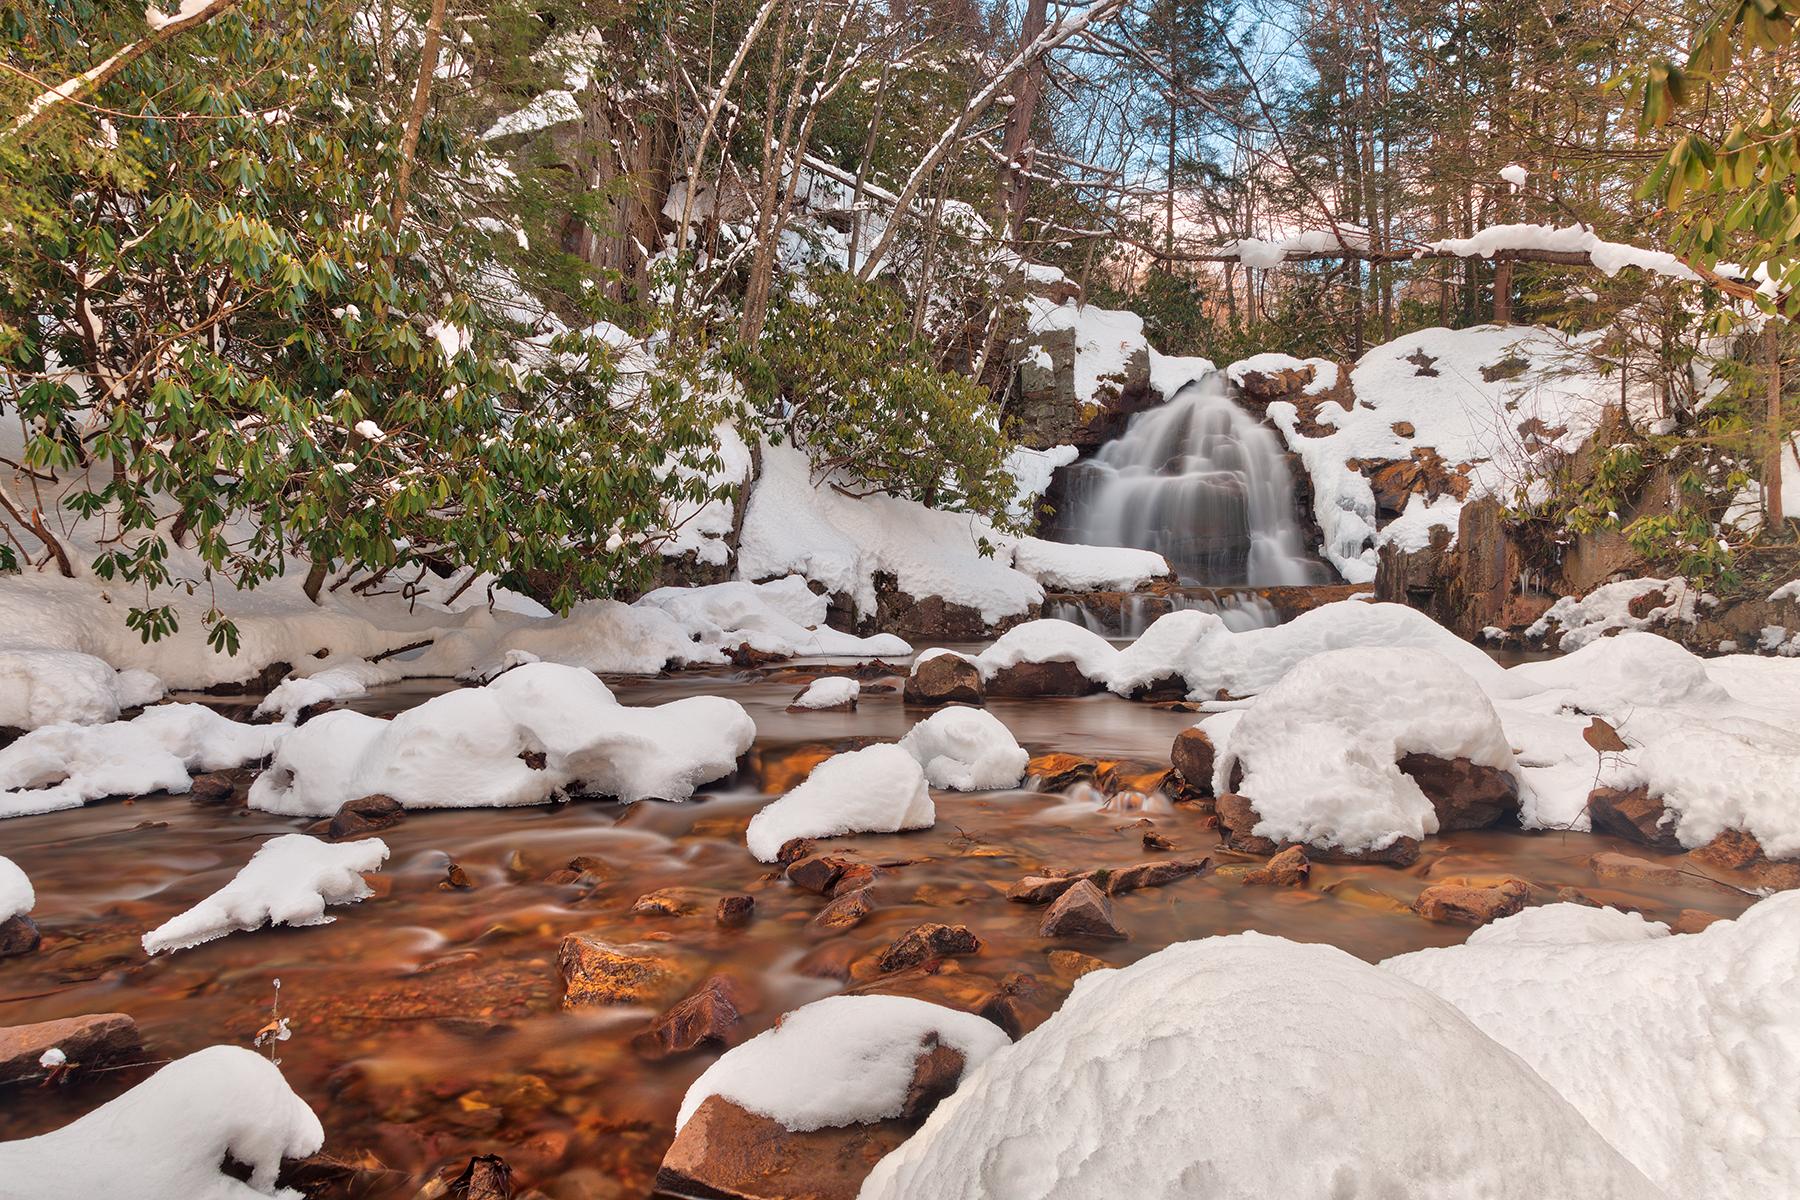 Hawk falls winter stream - hdr photo